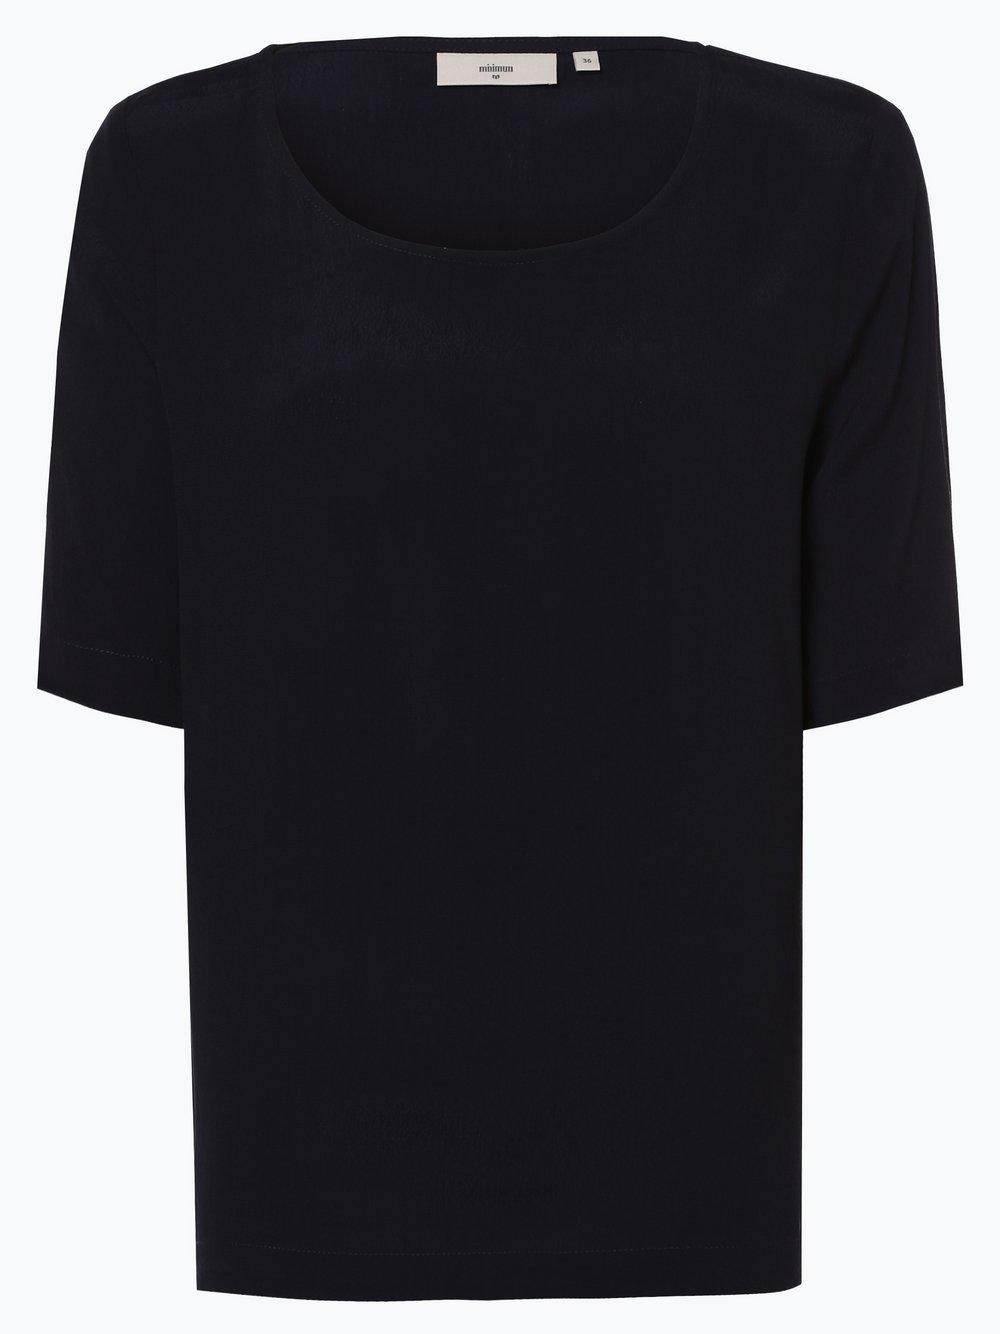 Minimum – Bluzka damska – Elvire, niebieski Van Graaf 438073-0001-00360